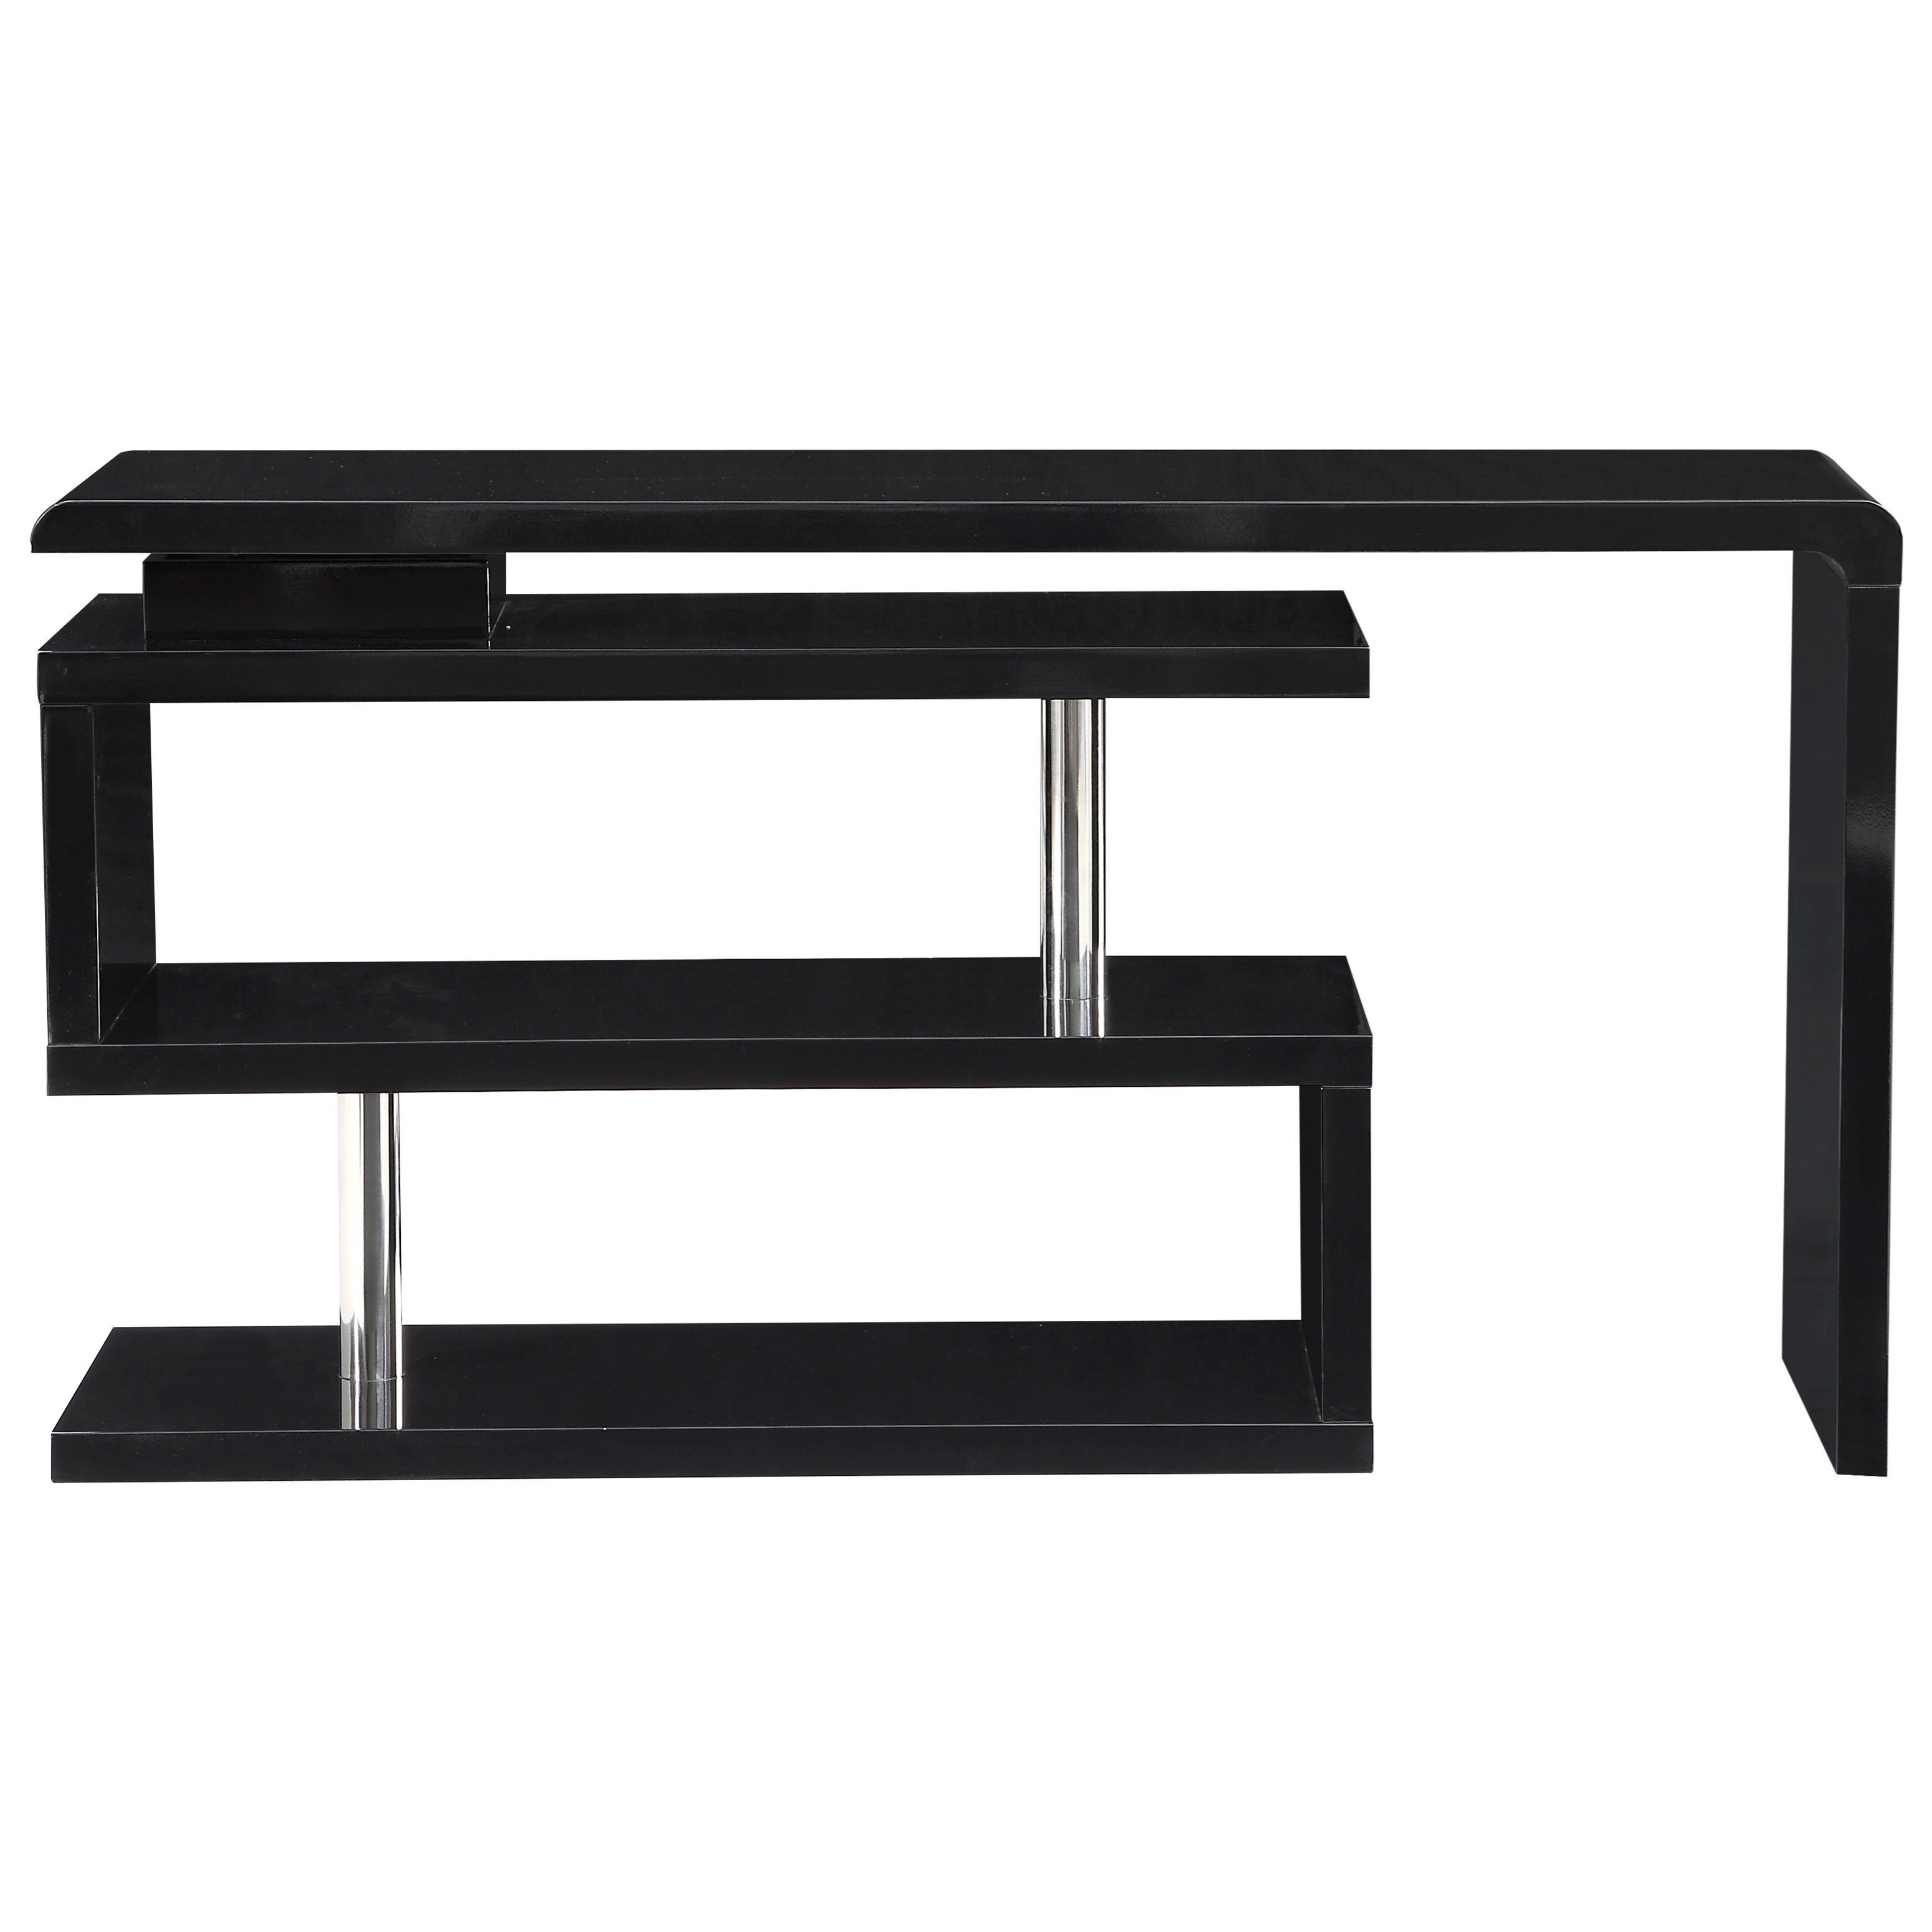 Adjustable Desk / Media Console